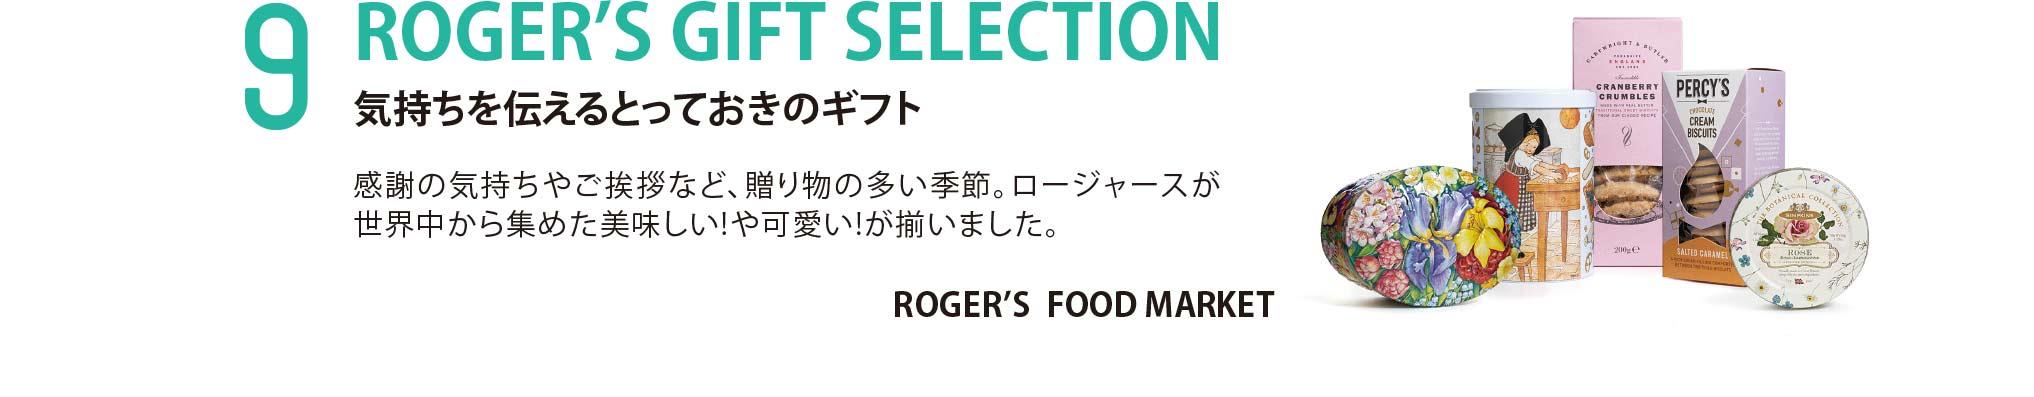 ROGER'S GIFT SELECTION 気持ちを伝えるとっておきのギフト